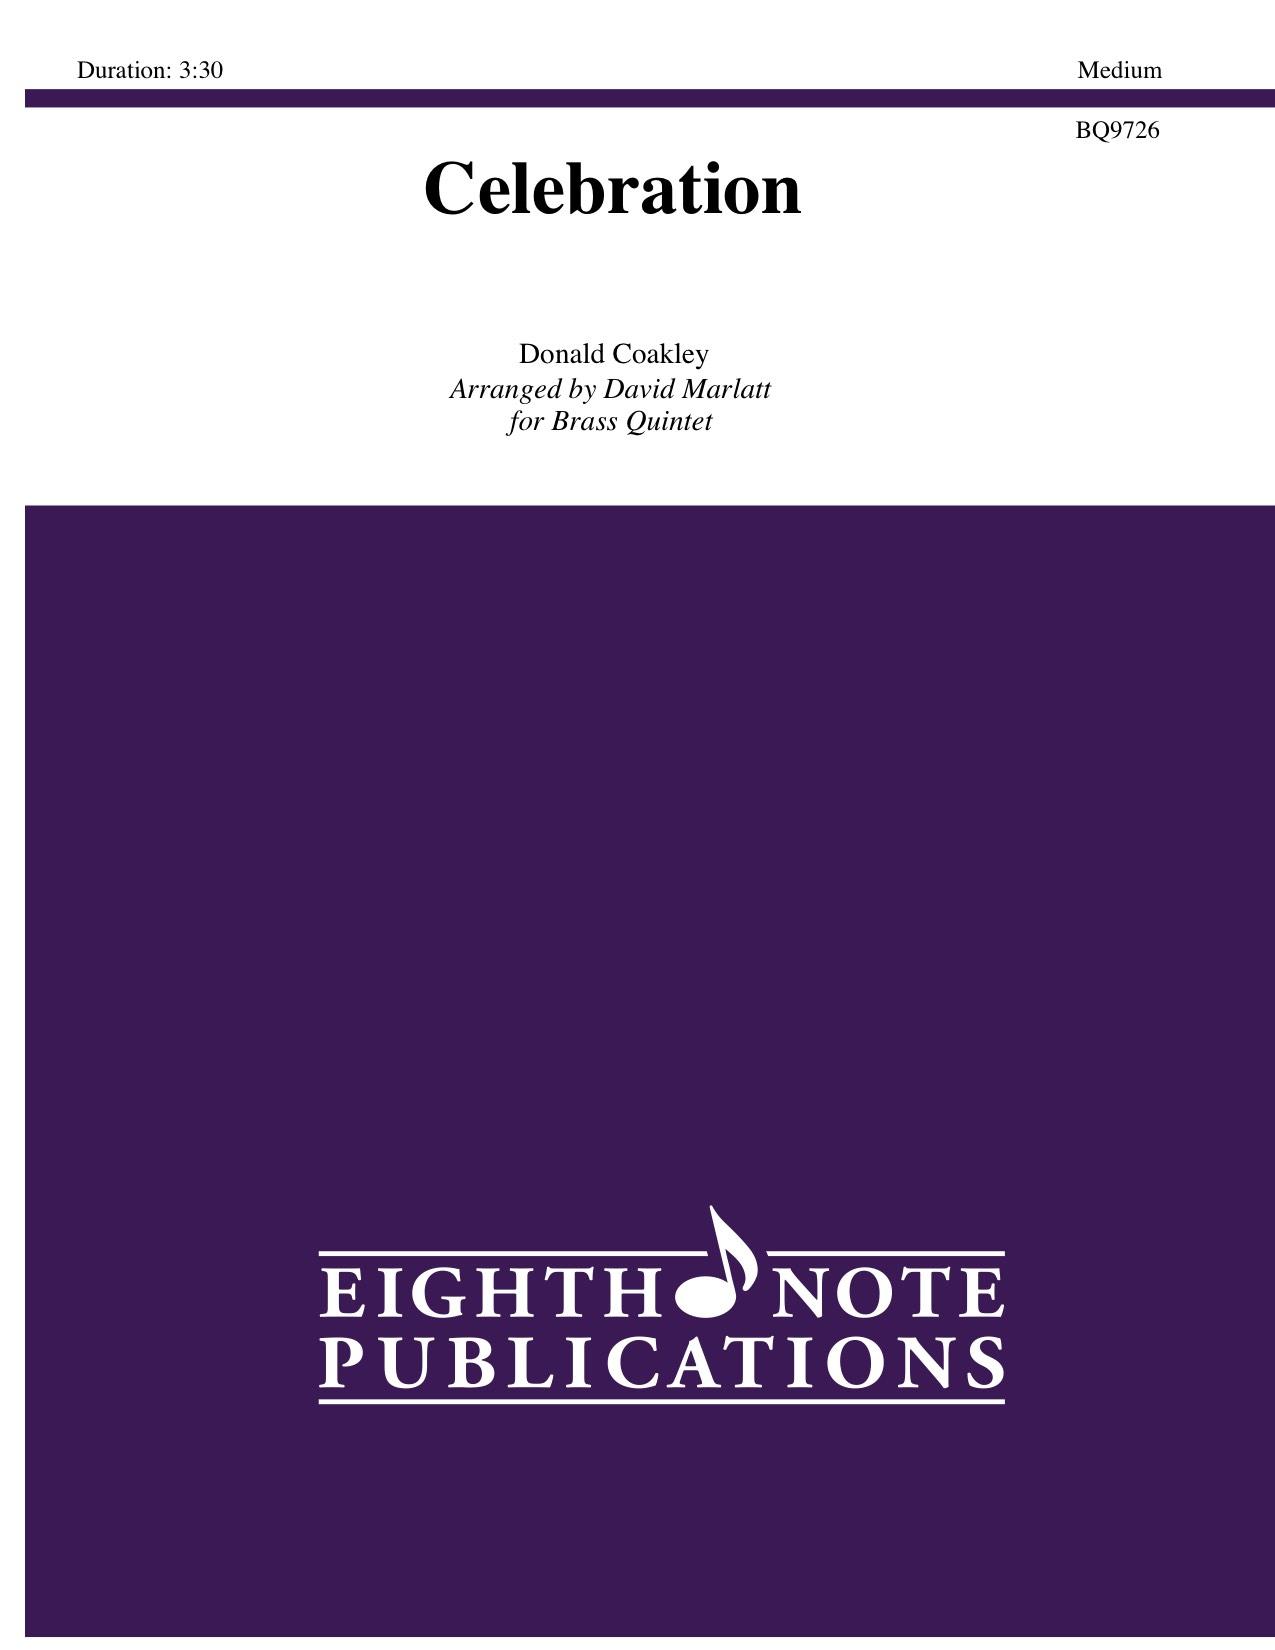 Celebration - Donald Coakley